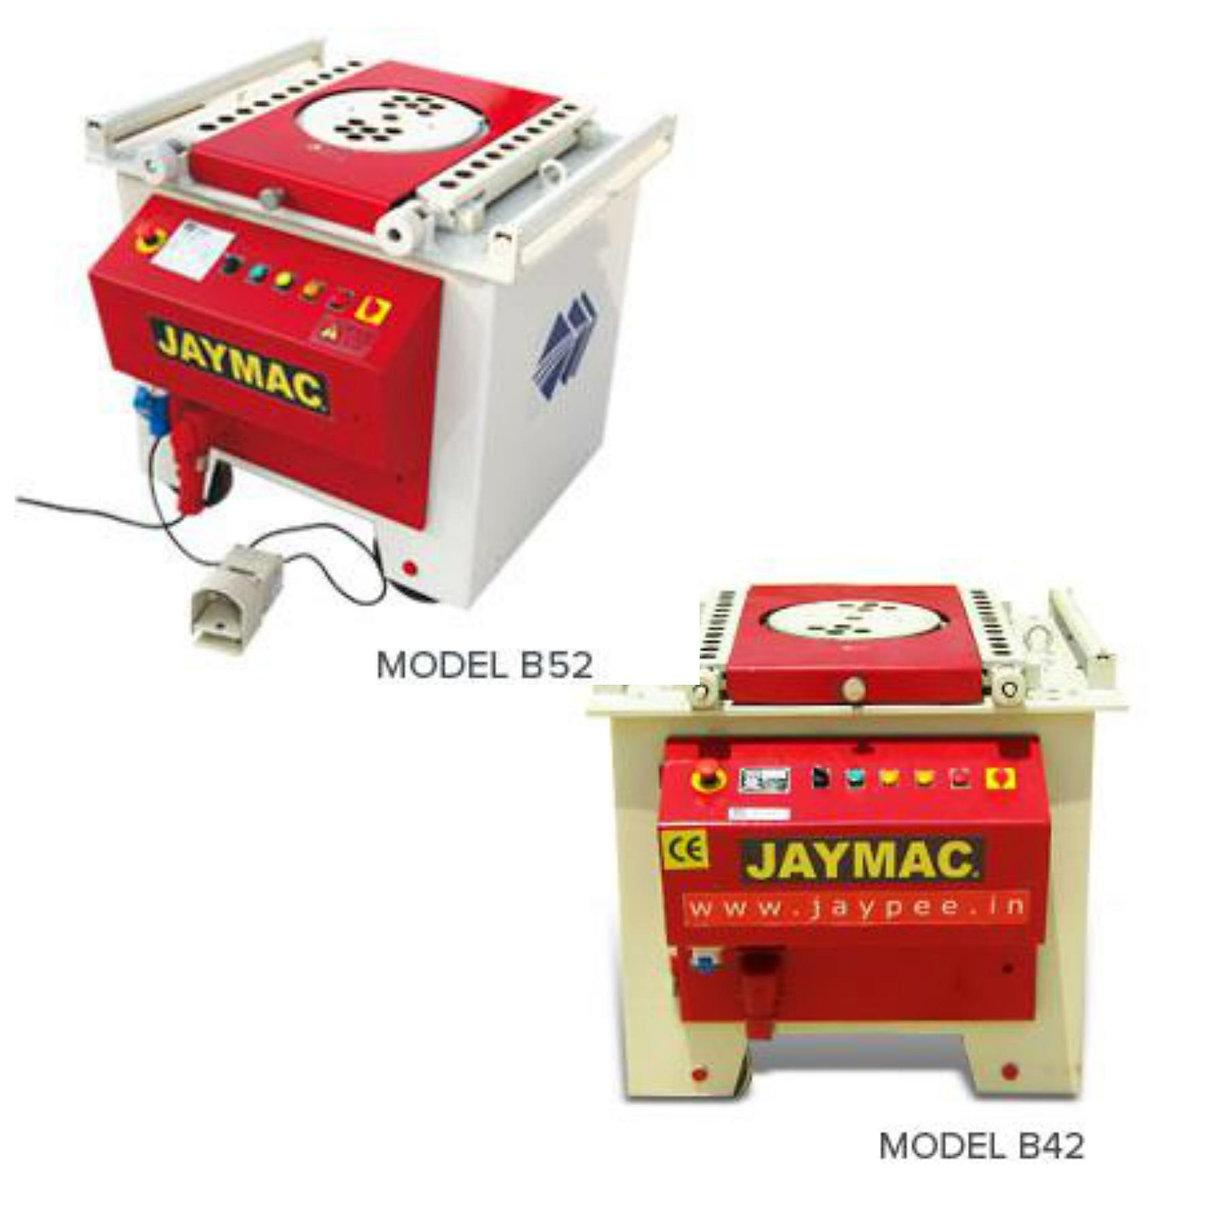 MODEL B52, MODEL B42